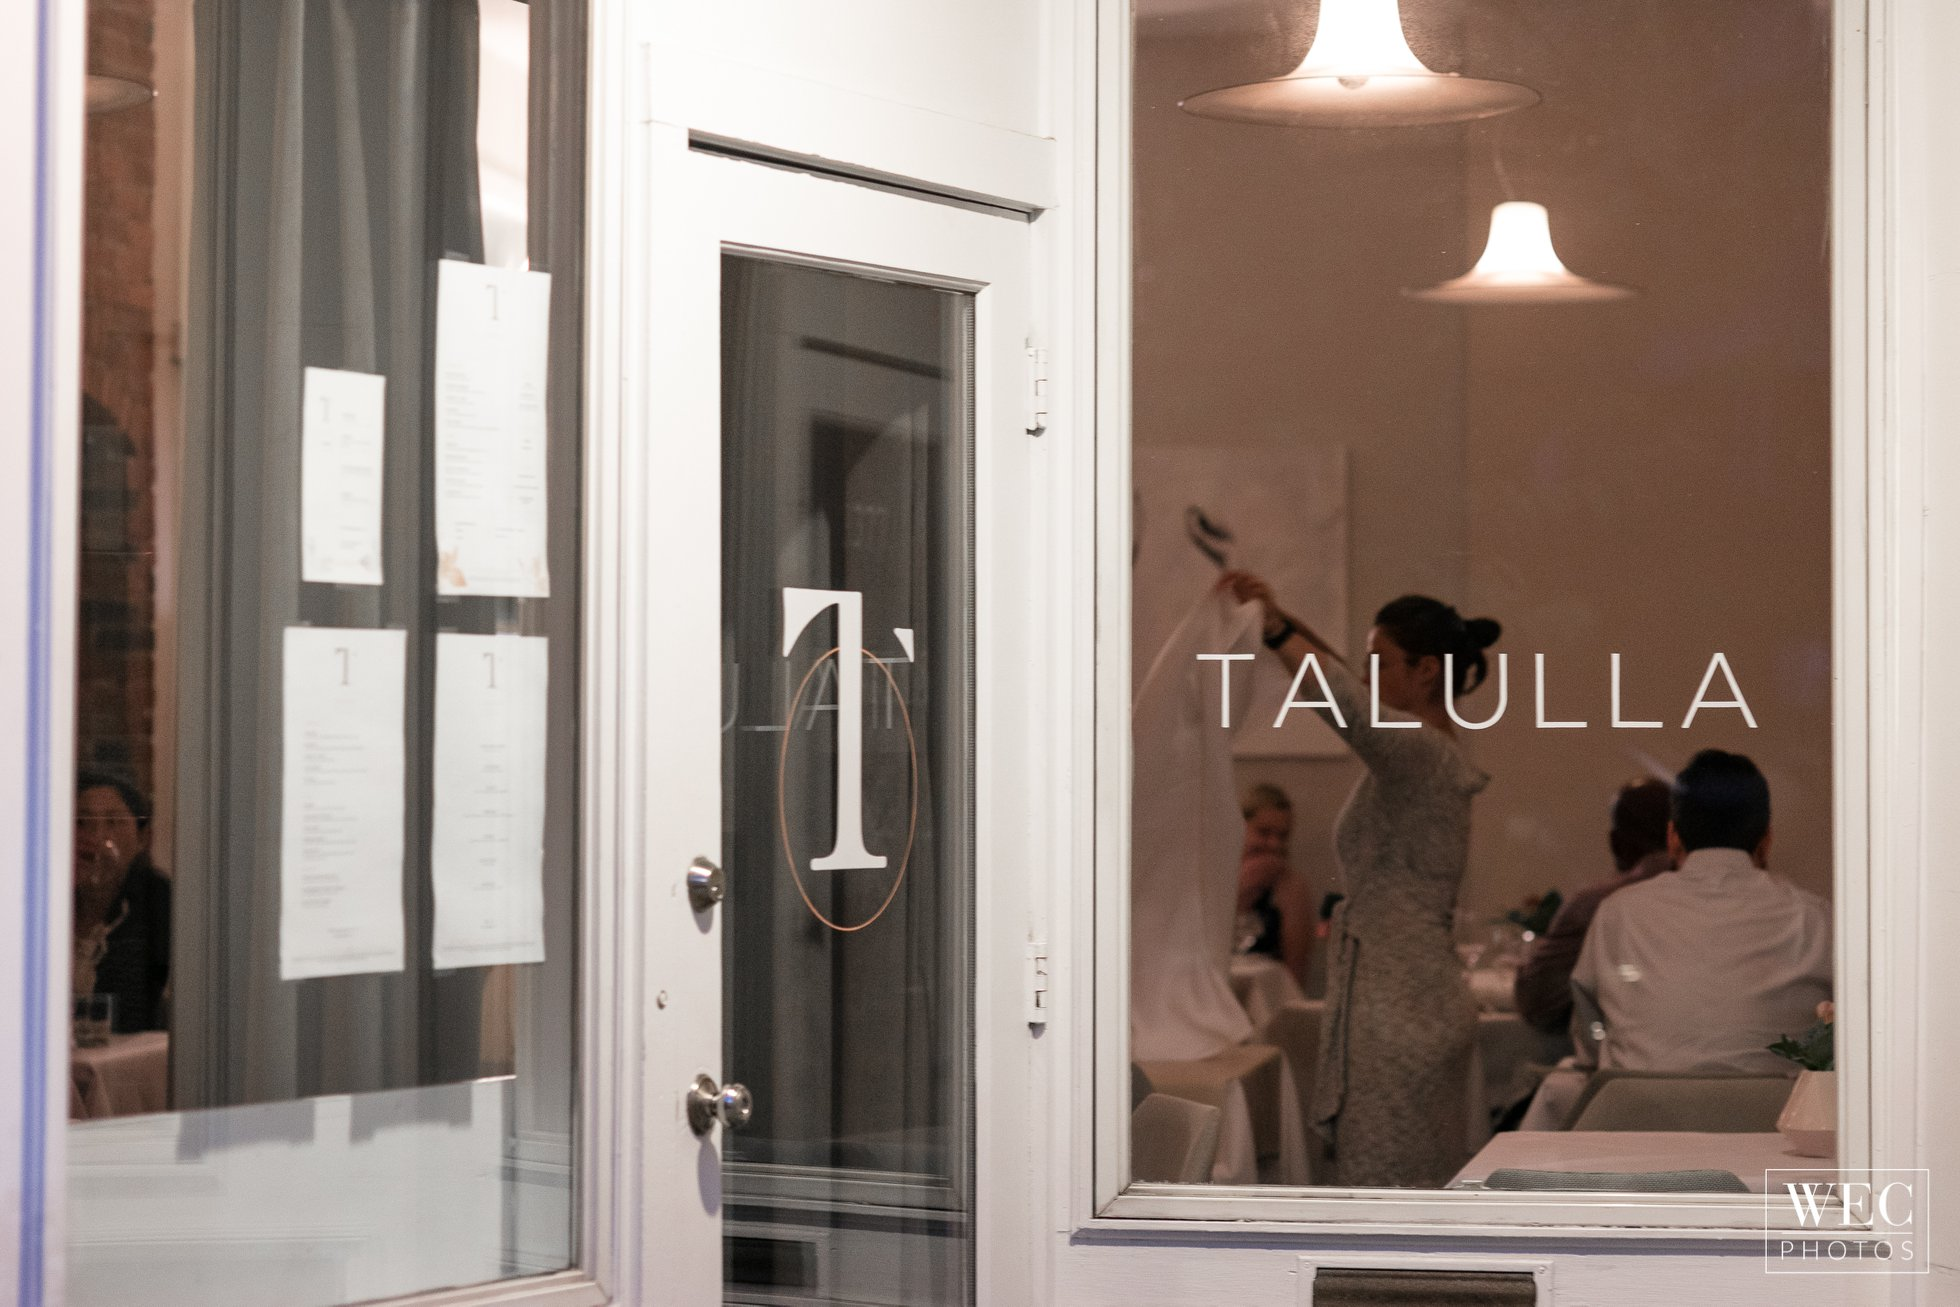 Talulla_windowsignage.jpg